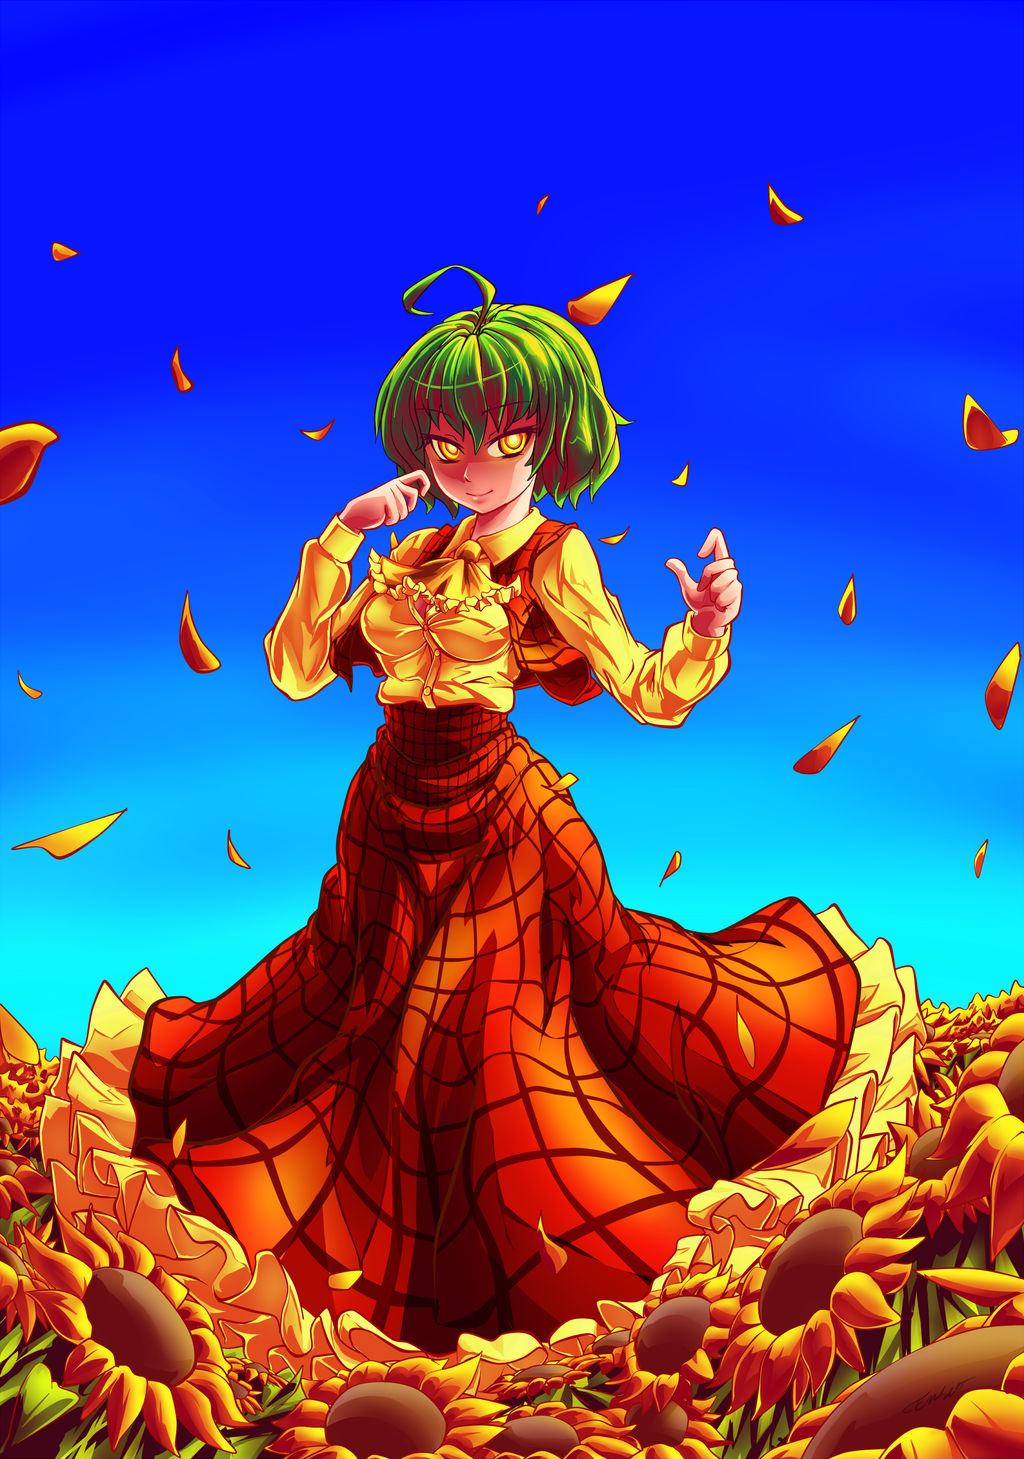 Touhou Terrifying Yuuka Kazami